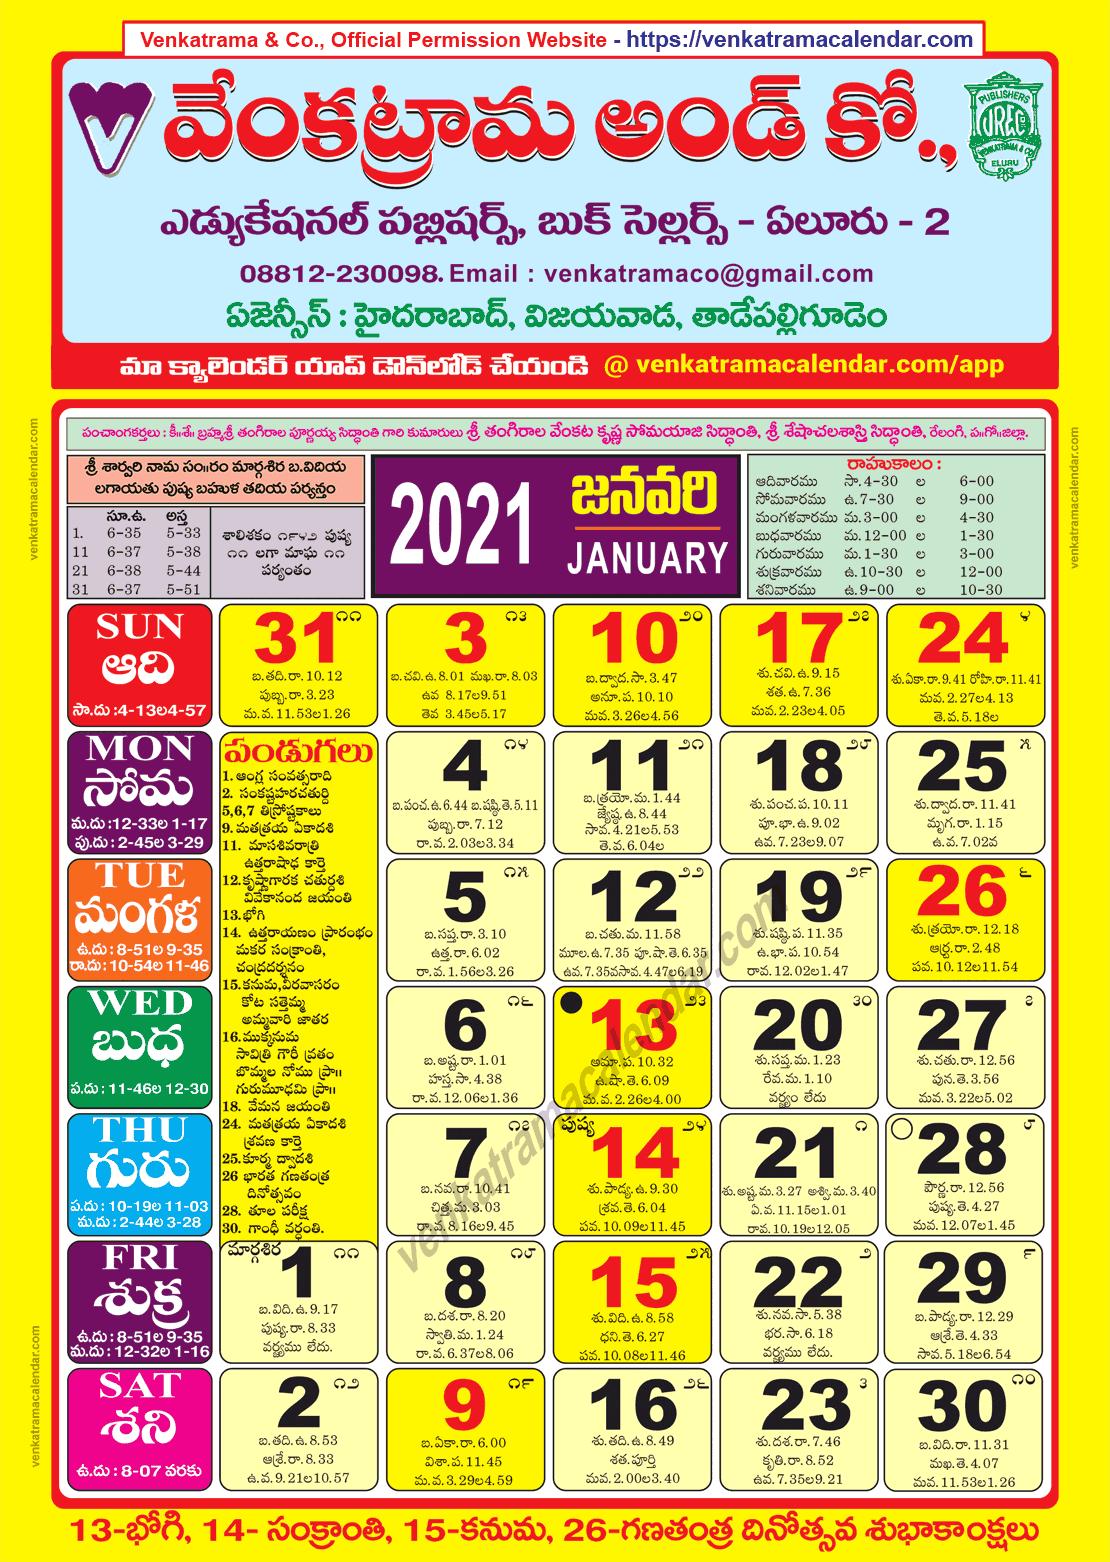 Telugu Calendar 2022 February.Venkatrama Co 2021 January Telugu Calendar Colour